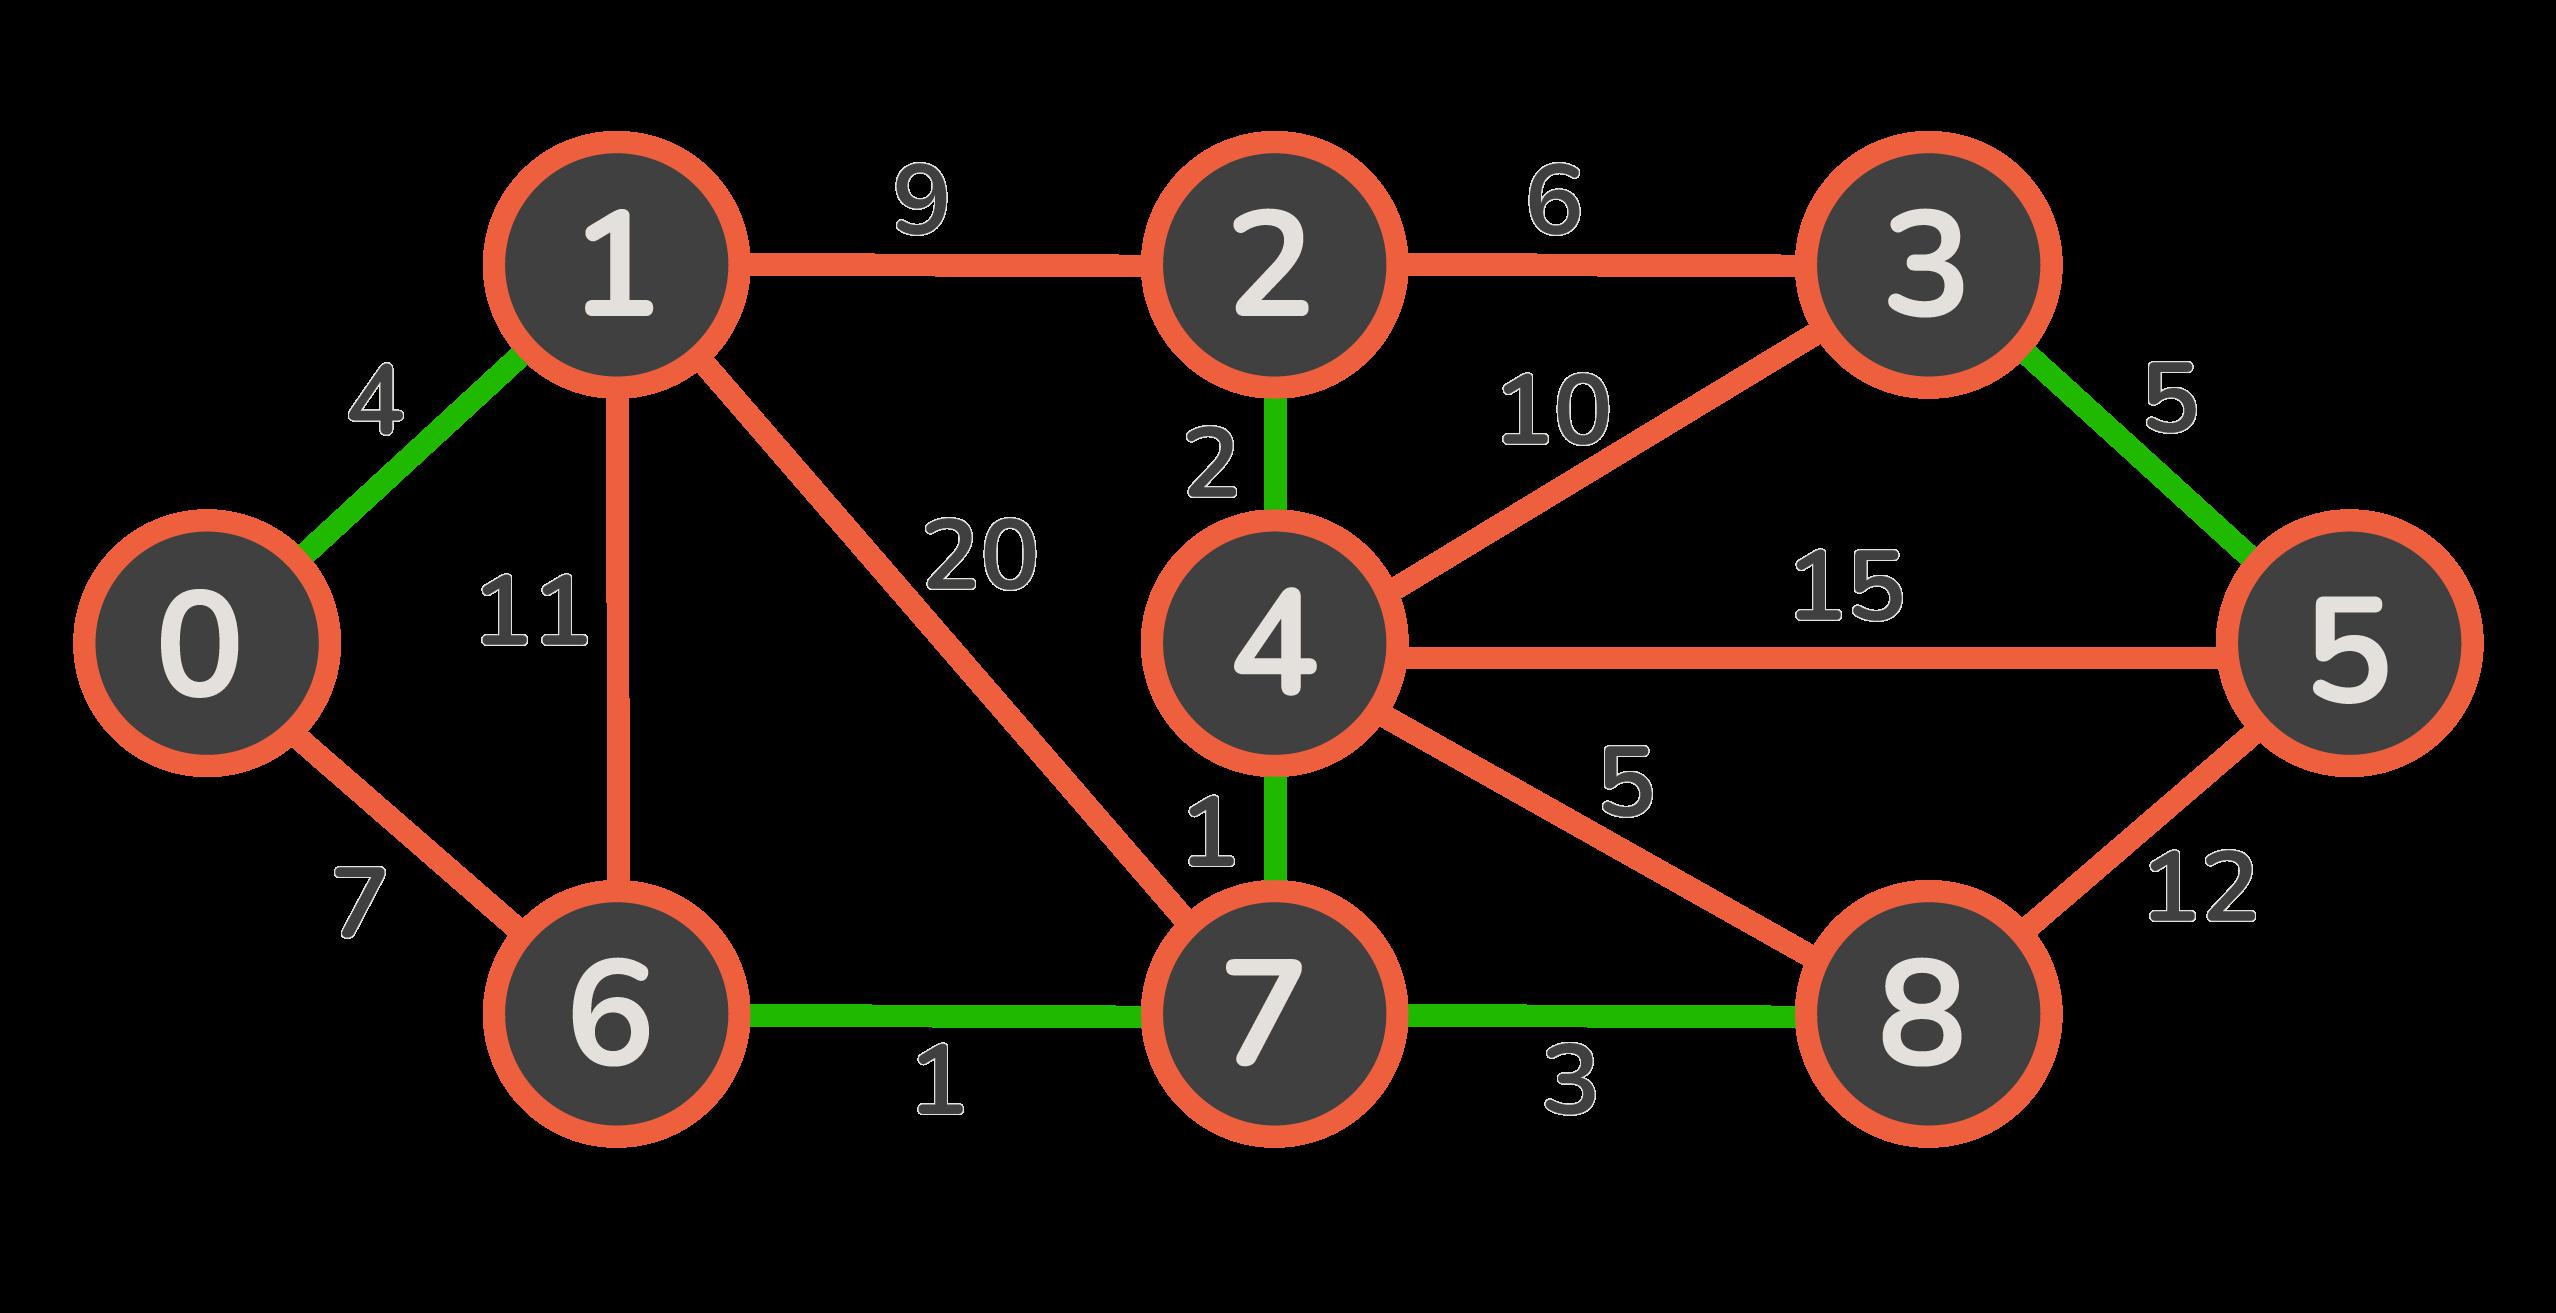 applying boruvka for minimum spanning tree